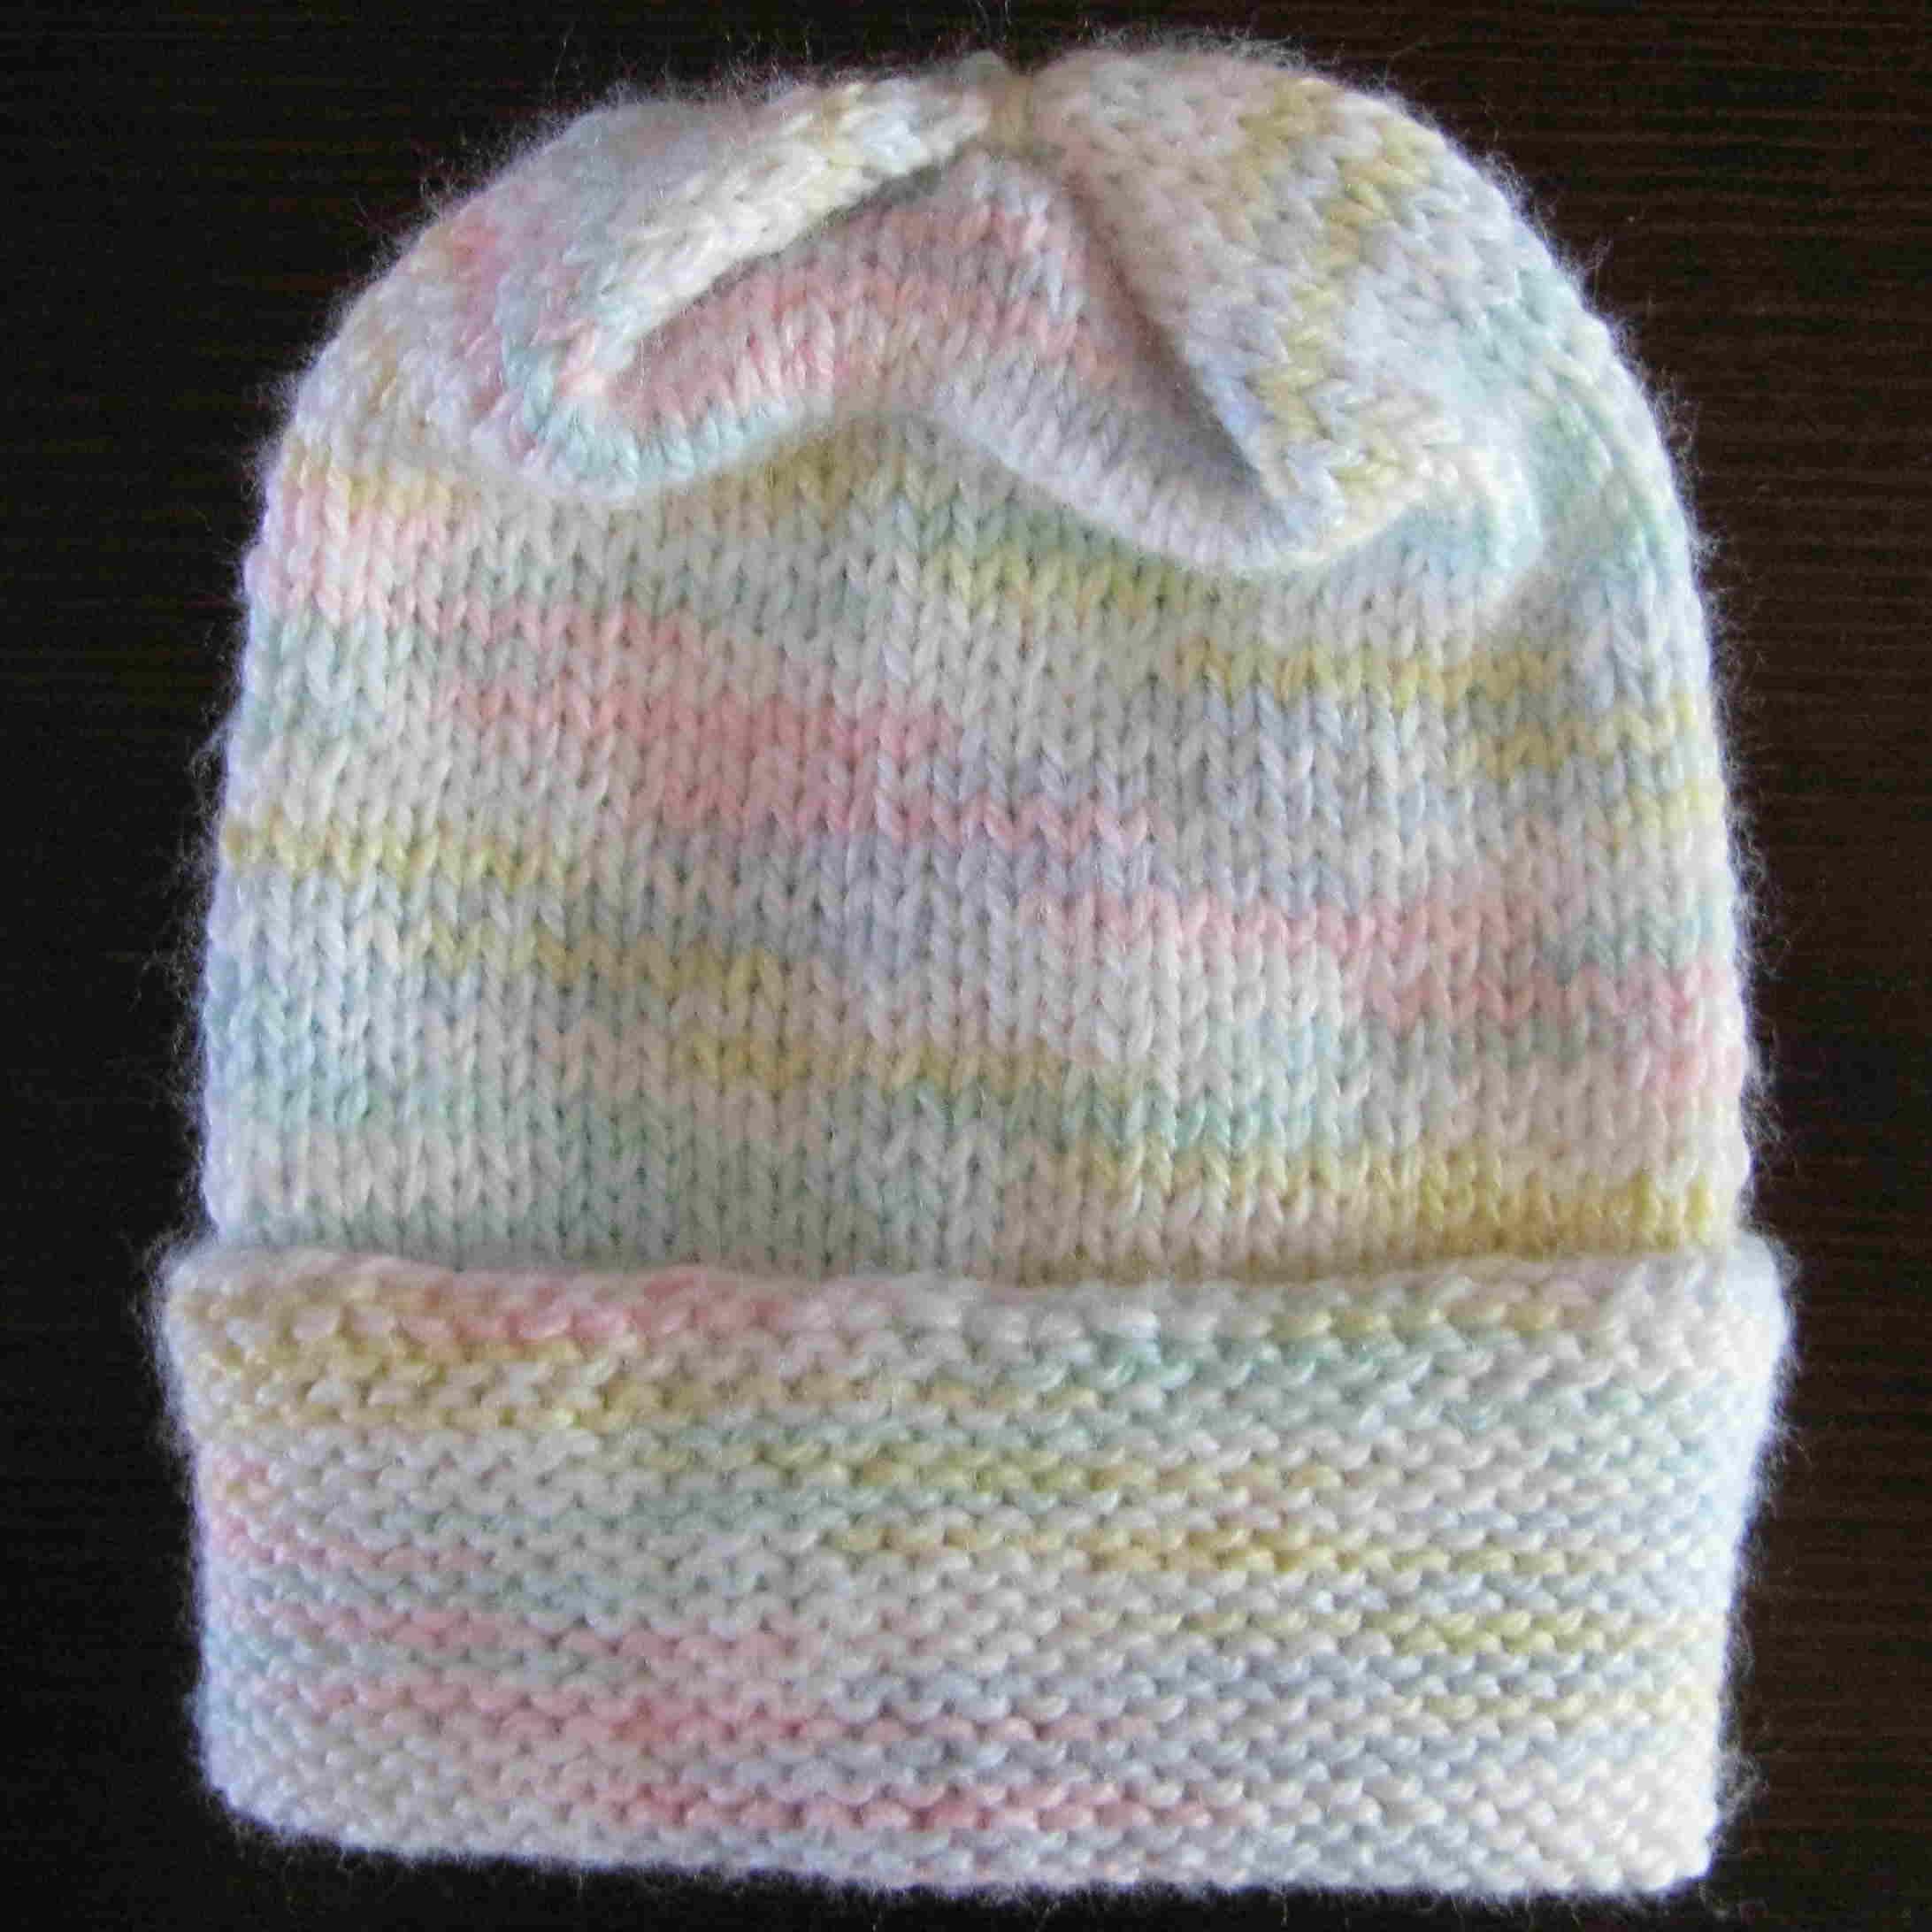 preemie baby knit hat | Knit Ideas | Pinterest | Preemies, Preemie ...